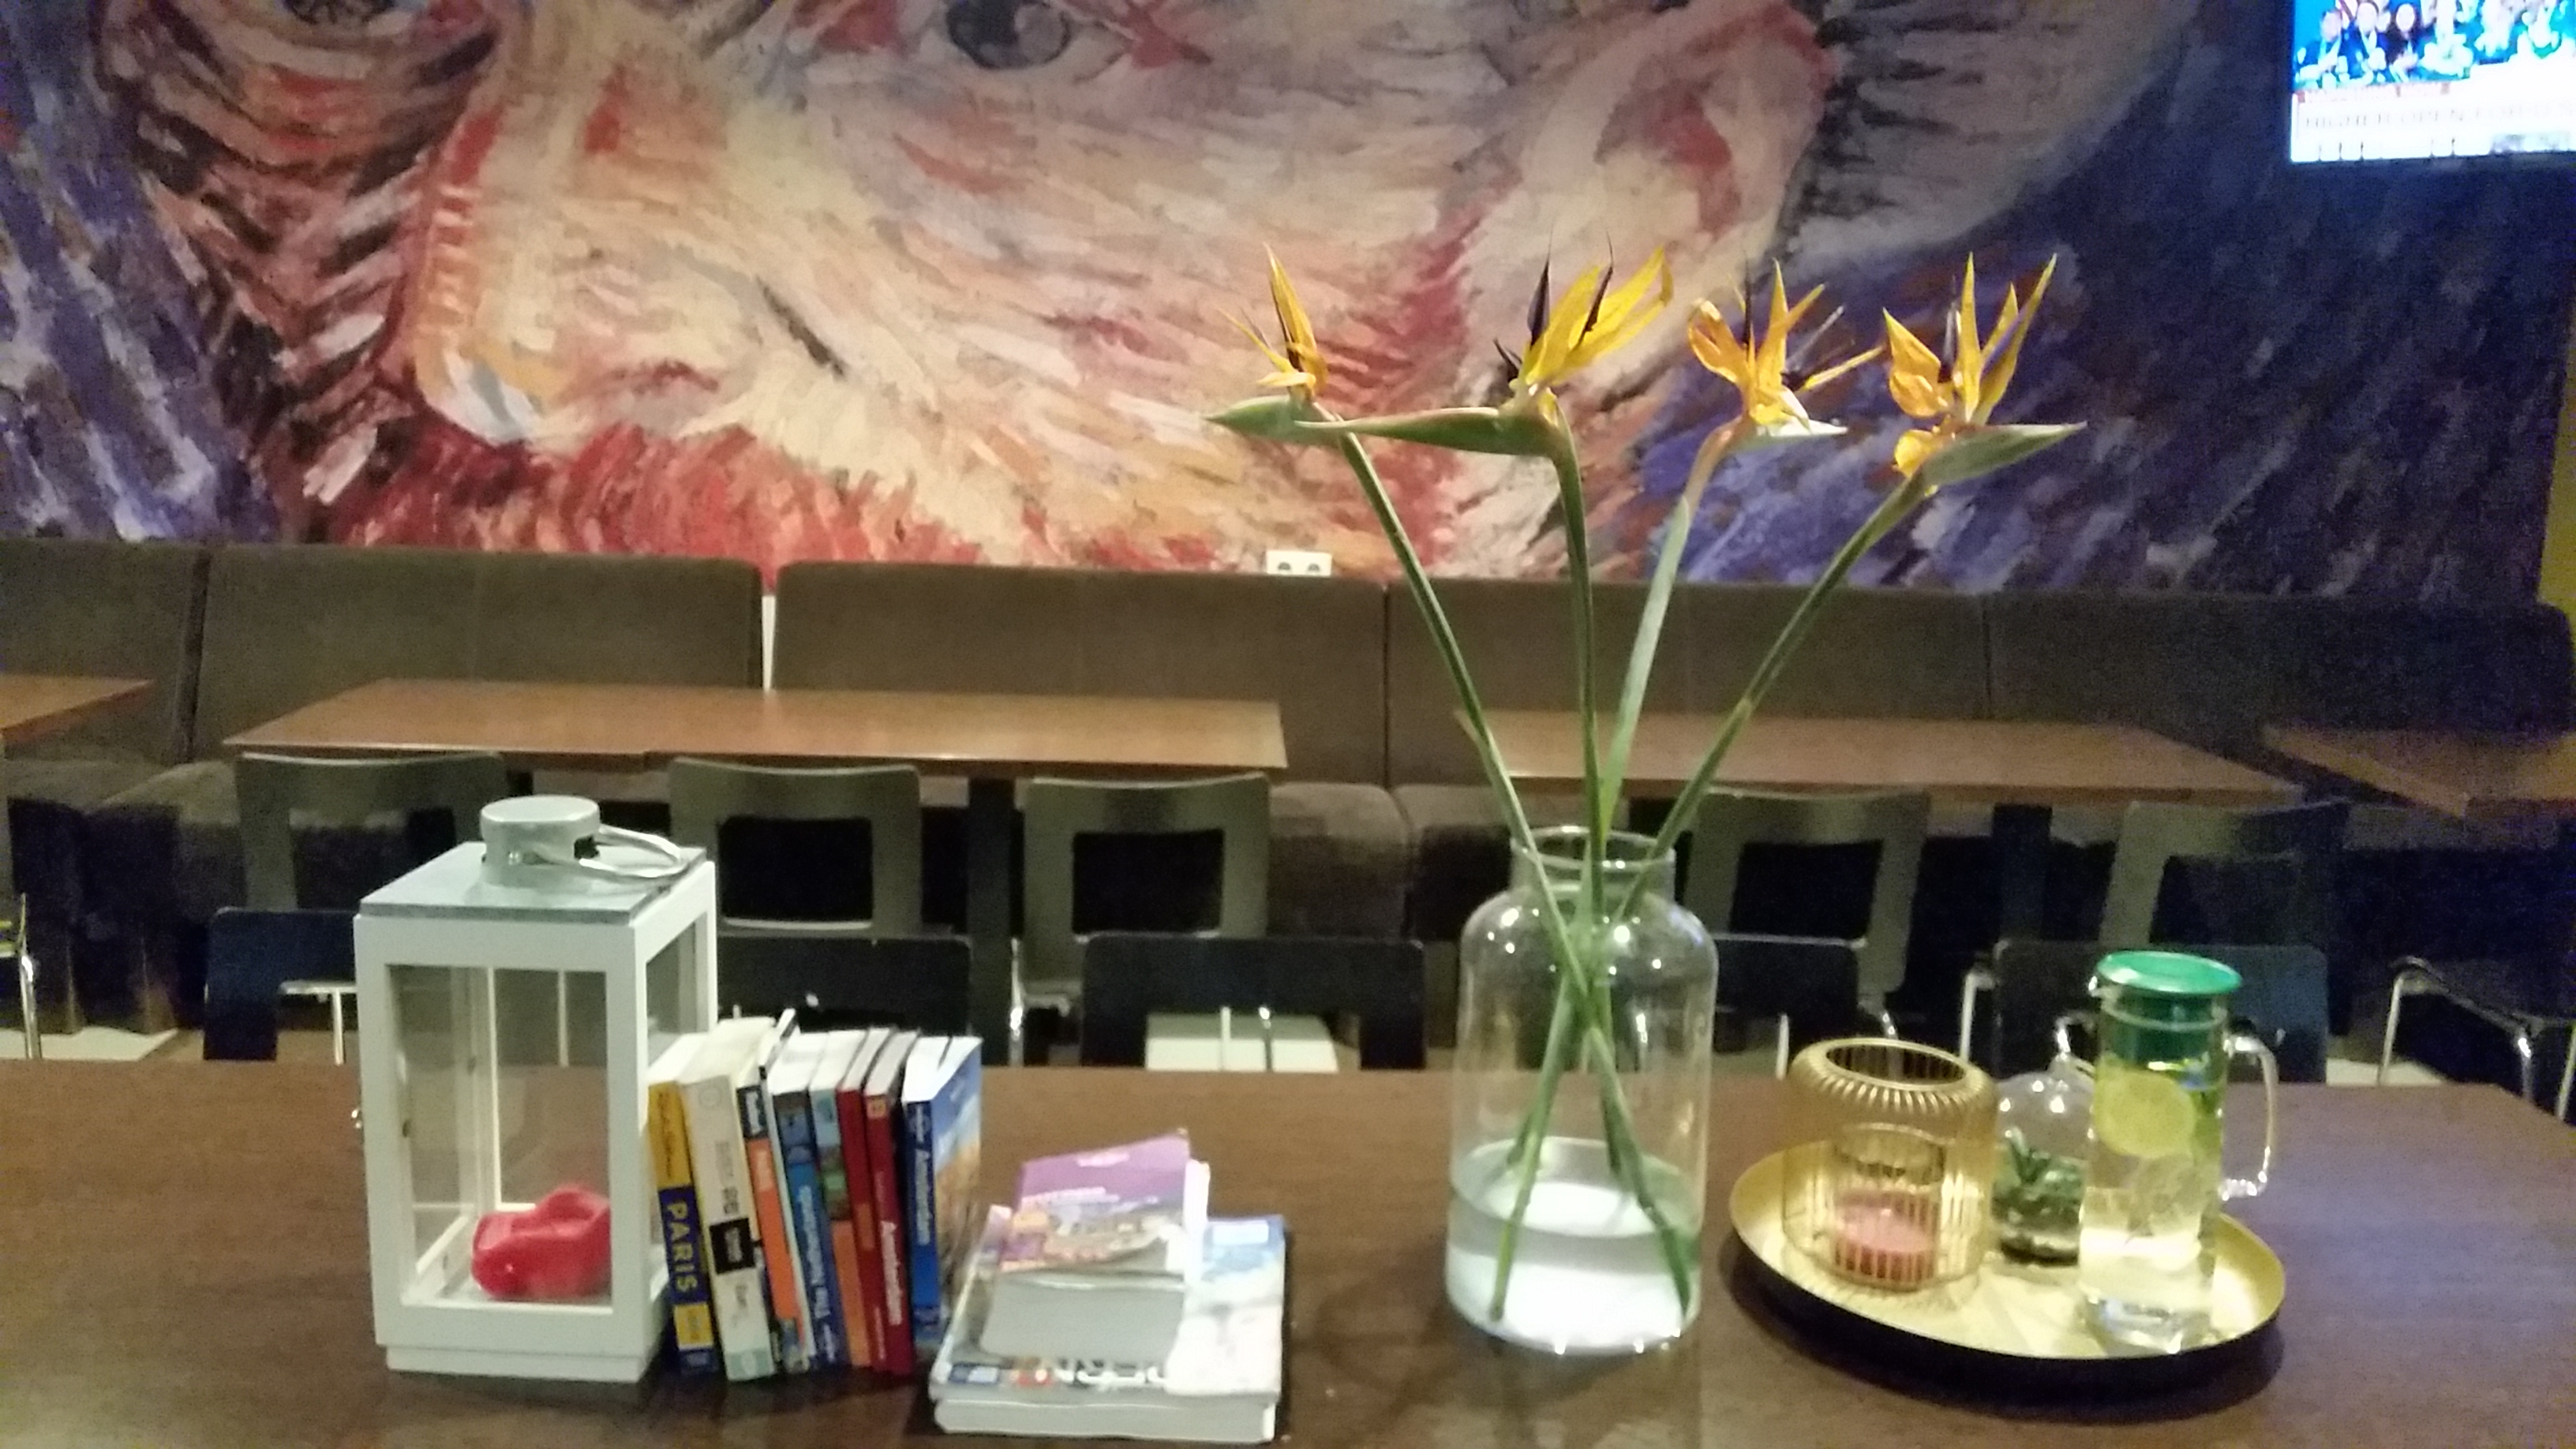 HOSTEL - Hostel Van Gogh